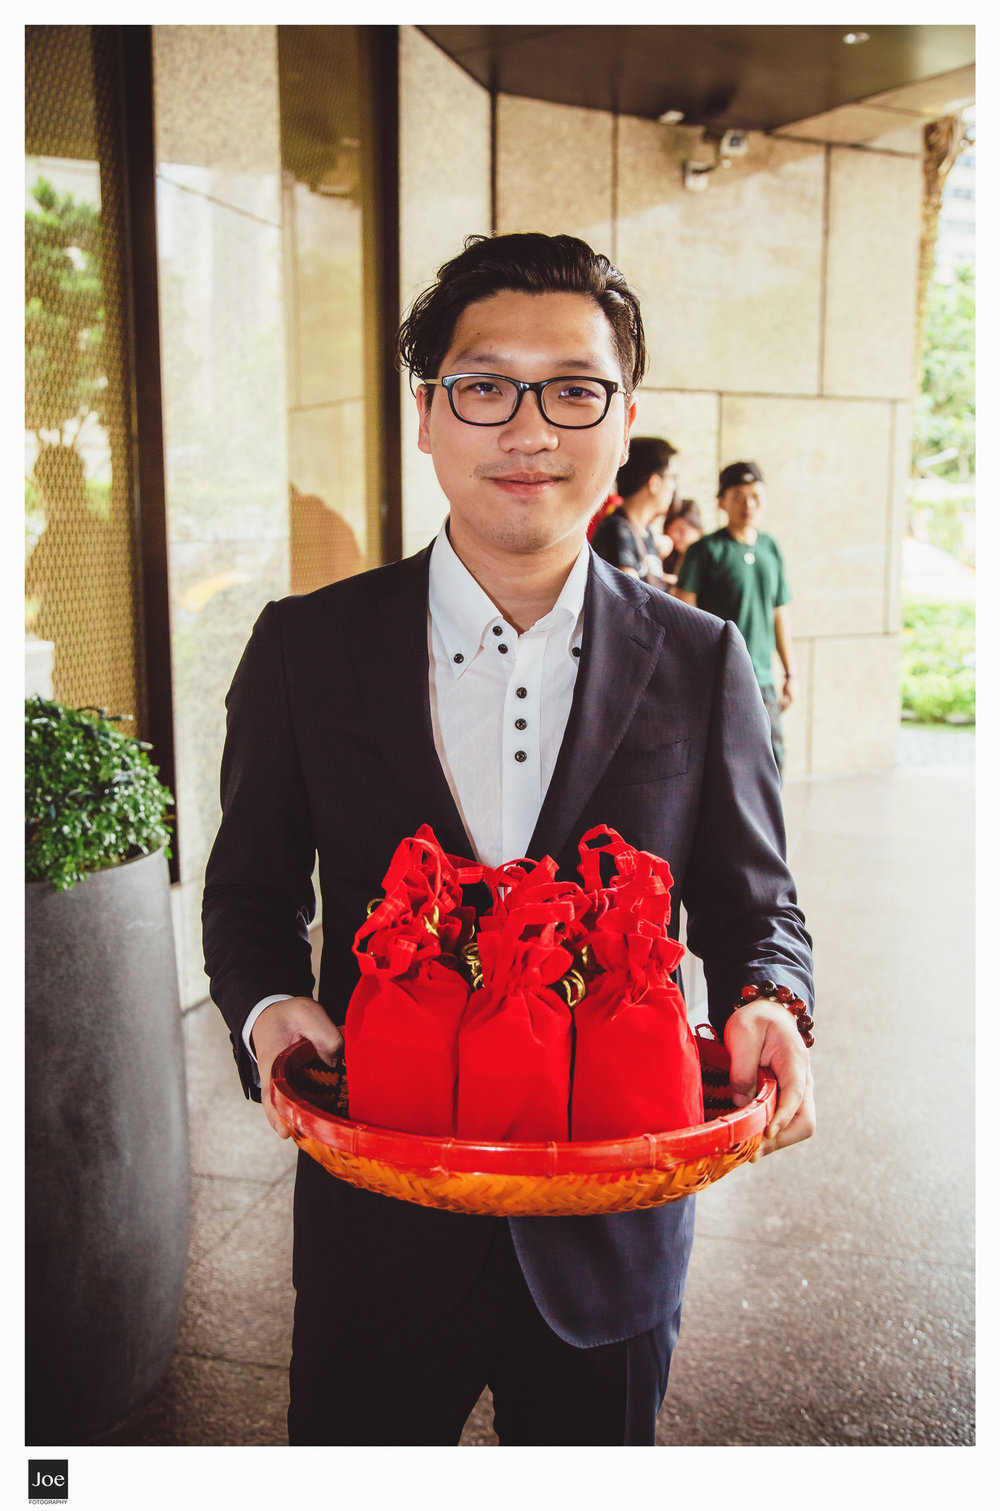 wedding-photography-shangri-la-far-eastern-plaza-hotel-ariel-sam-joe-fotography-039.jpg